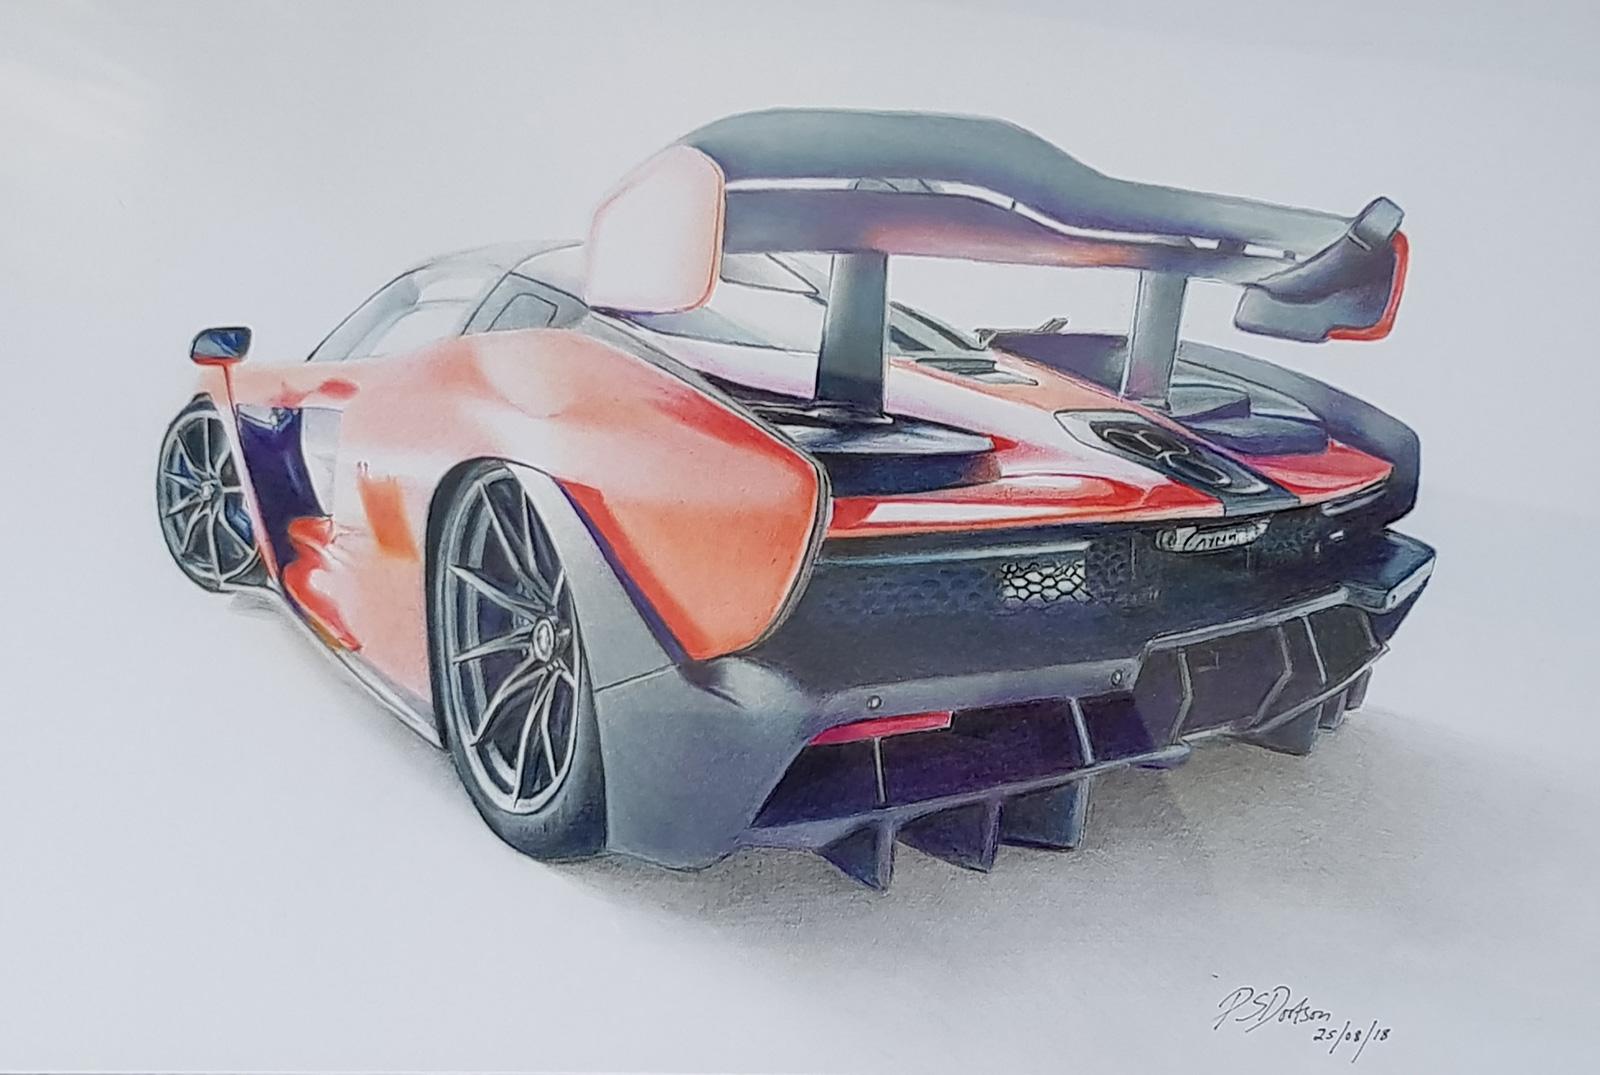 McLaren-Lrg